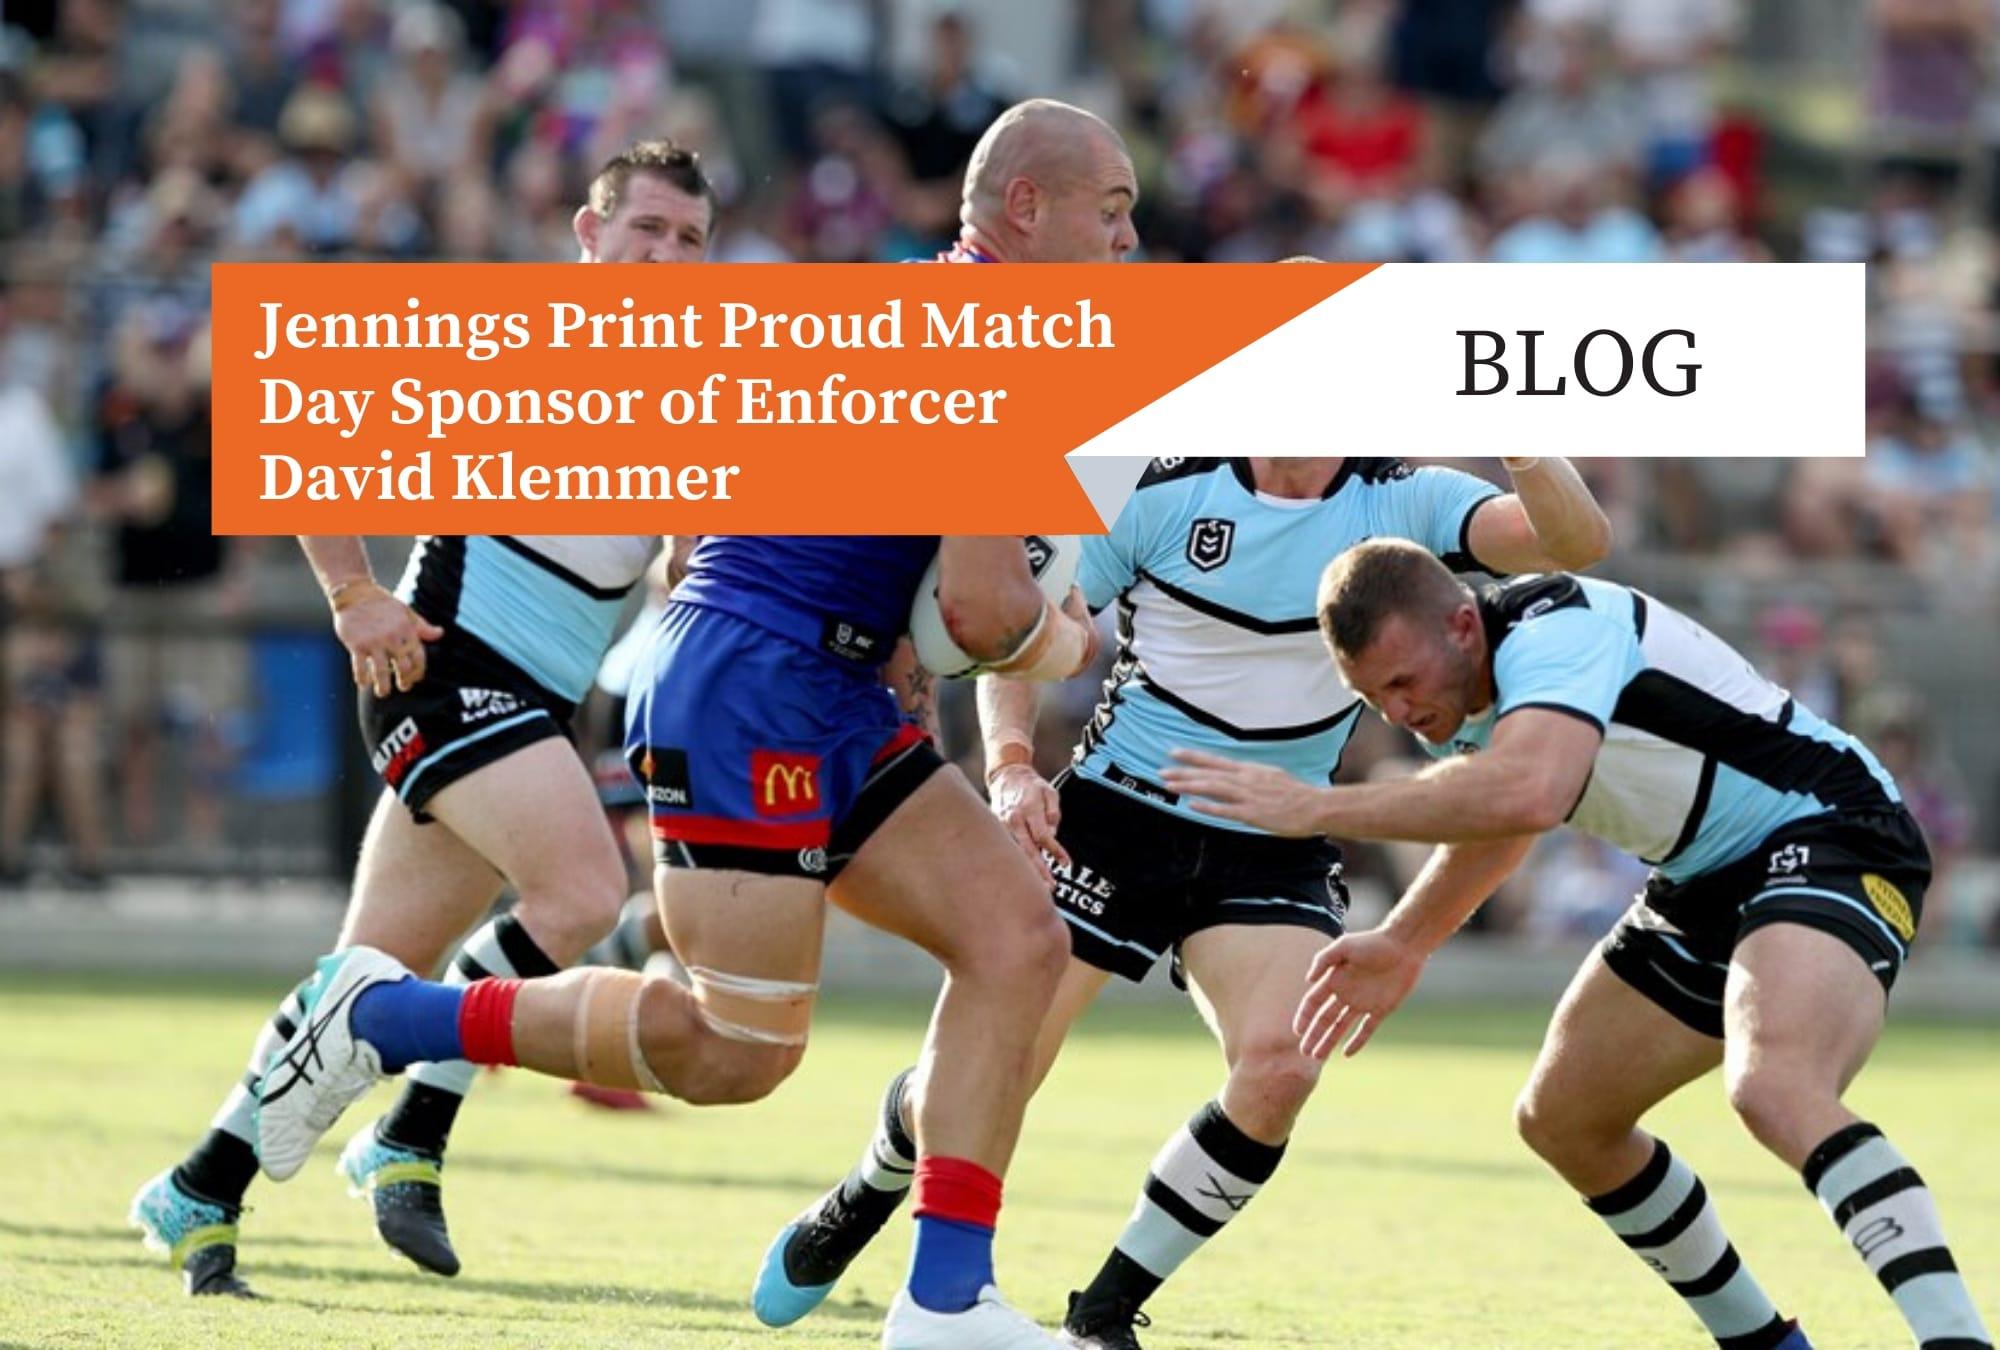 JENNINGS PRINT PROUD MATCH DAY SPONSOR OF ENFORCER DAVID KLEMMER